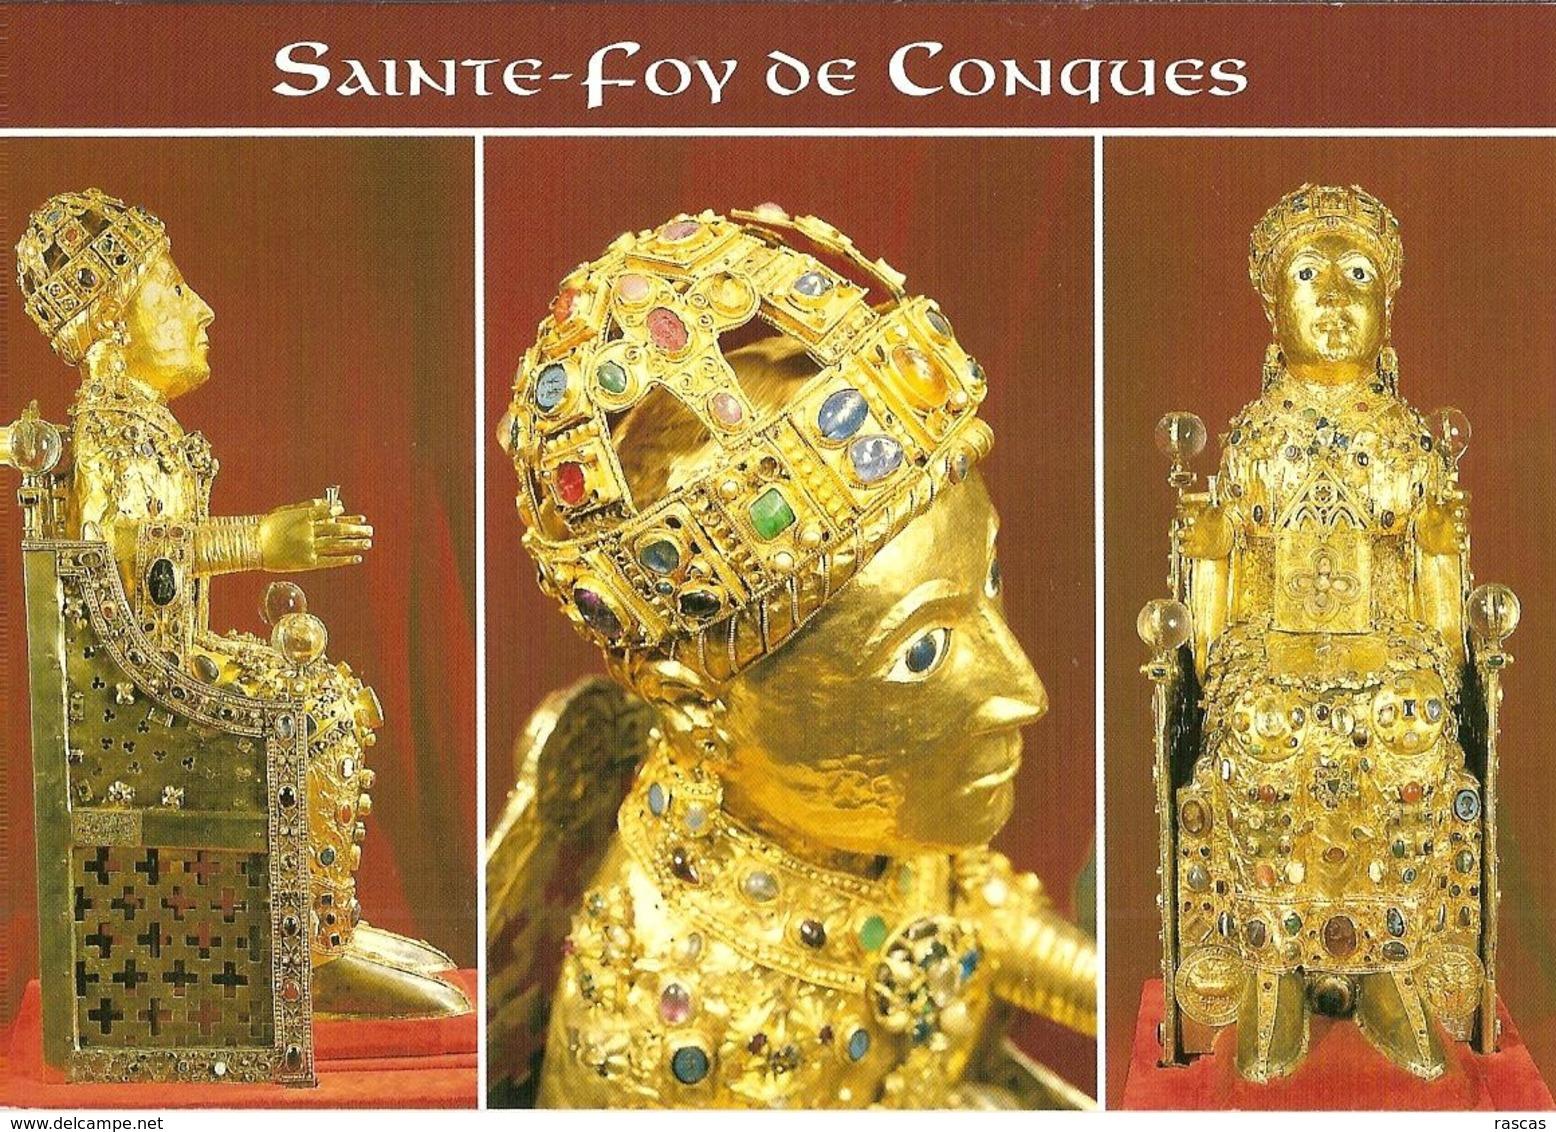 CPM - AVEYRON - SAINTE FOY DE CONQUES - TRESOR DE CONQUES - France